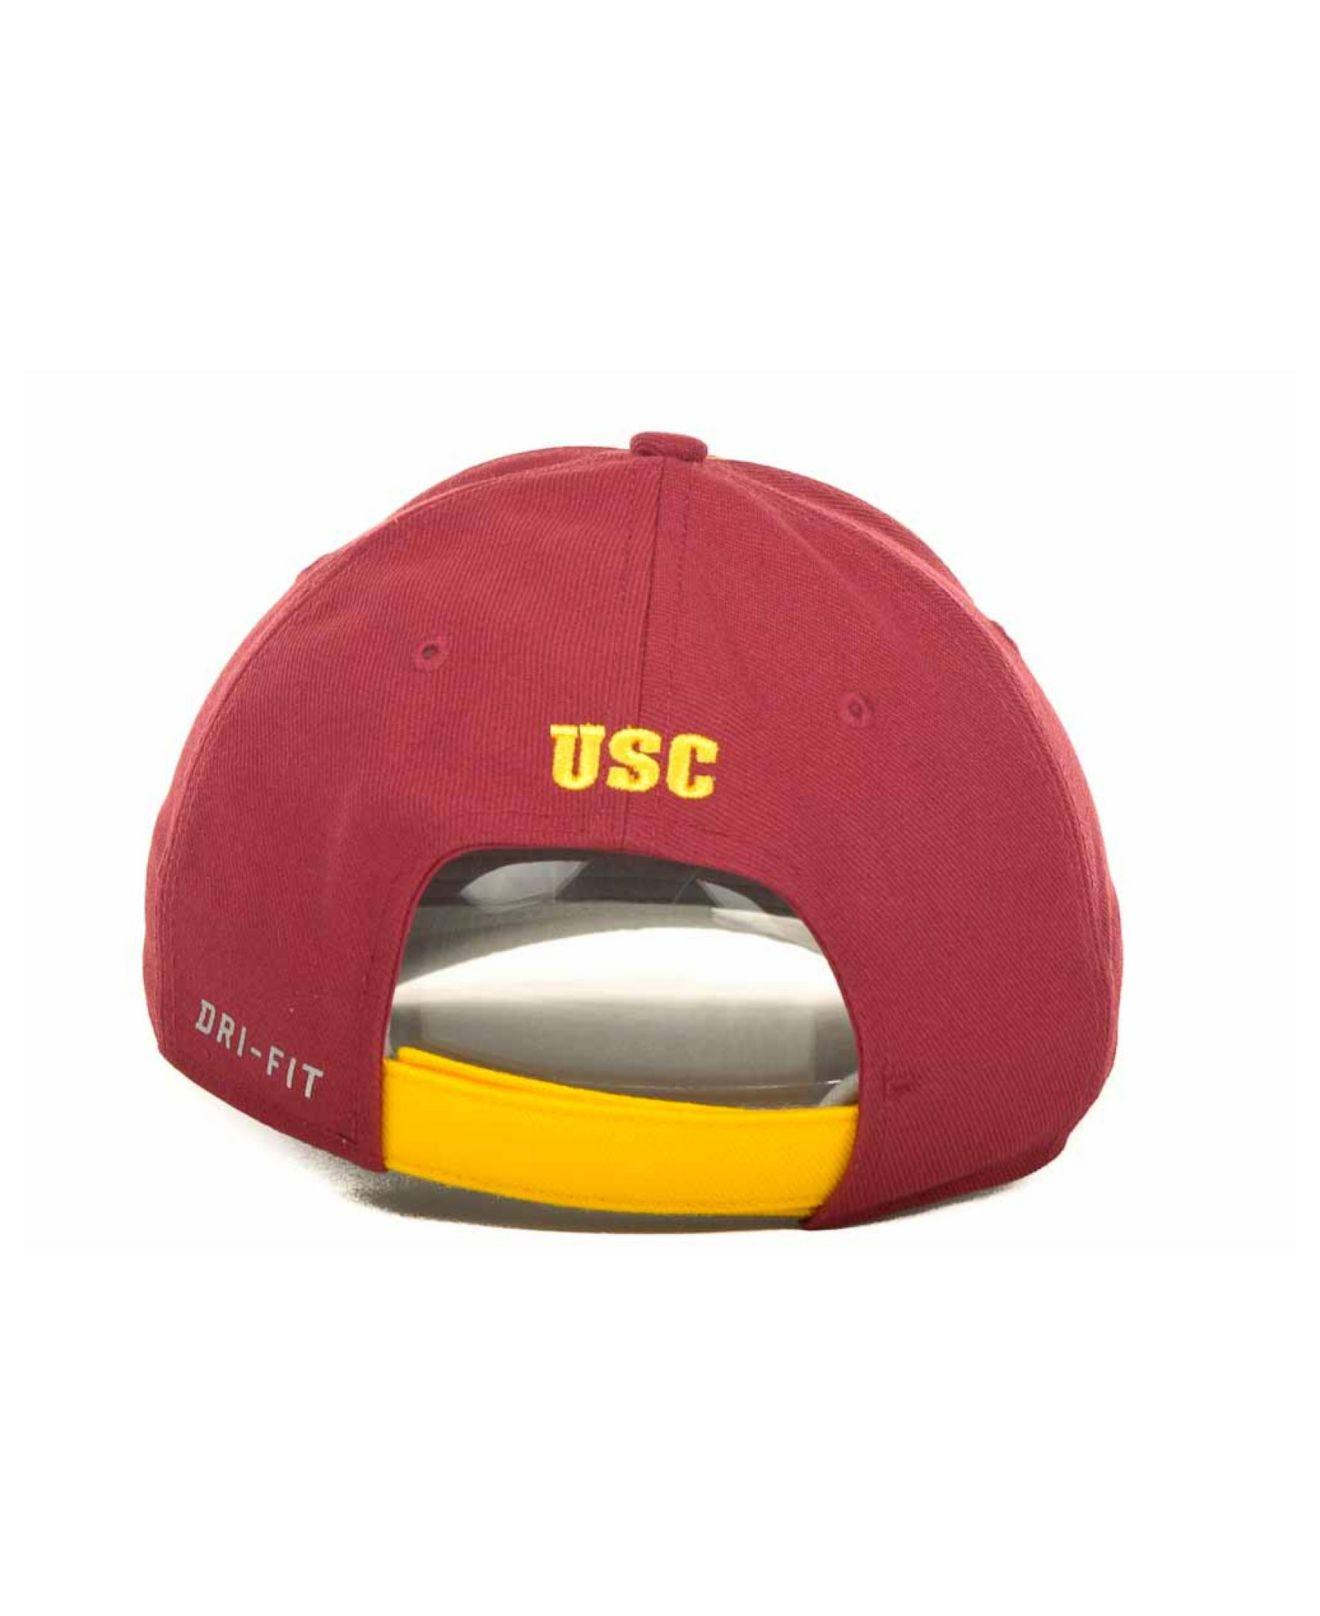 quality design 1fdf8 168dc Lyst - Nike Usc Trojans Sideline Legacy 91 Cap in Red for Men